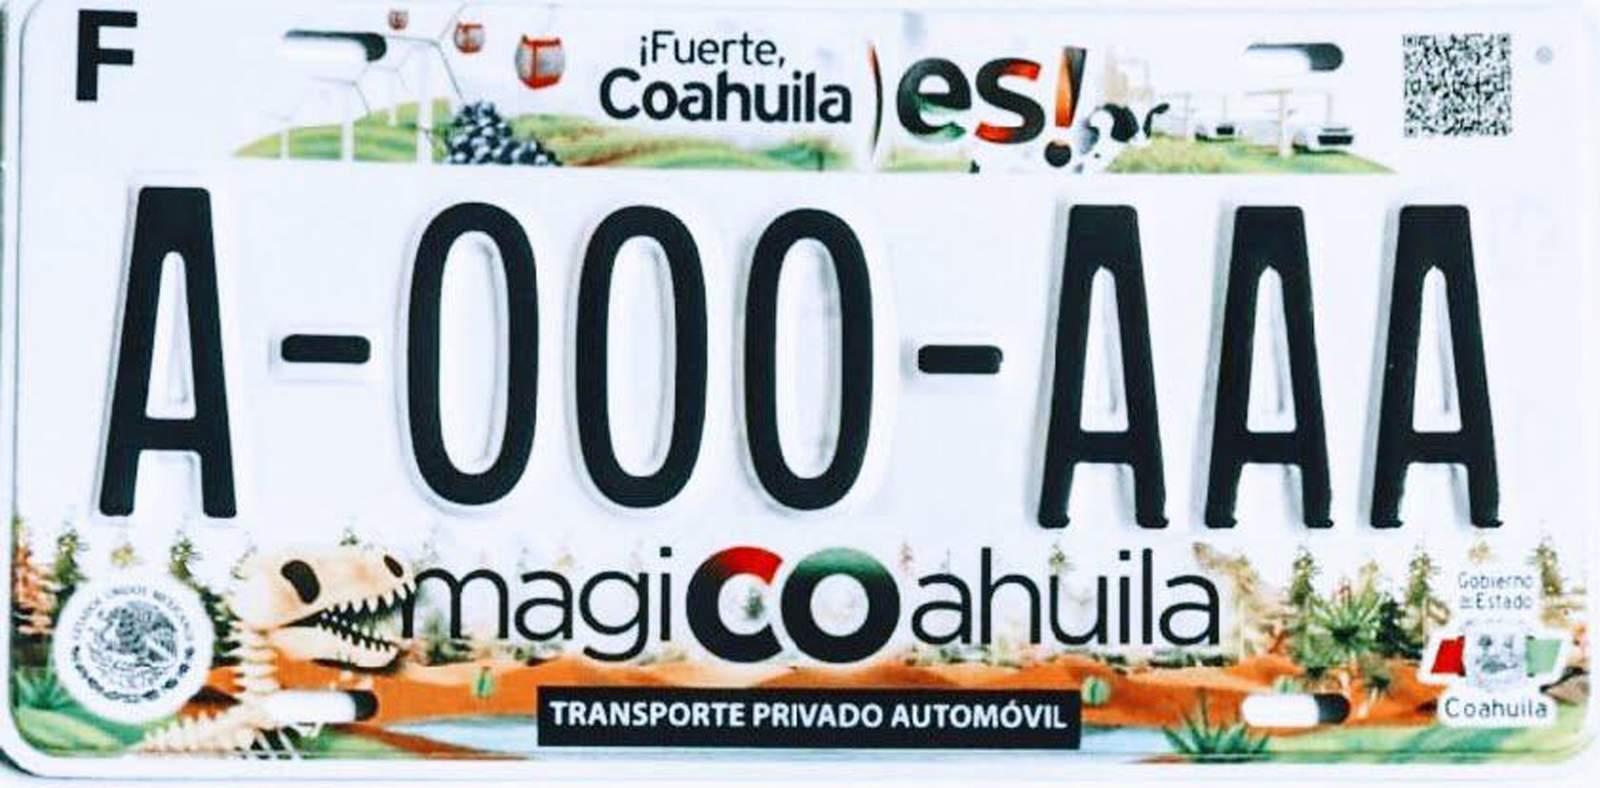 Arranca el canje de placas en Coahuila